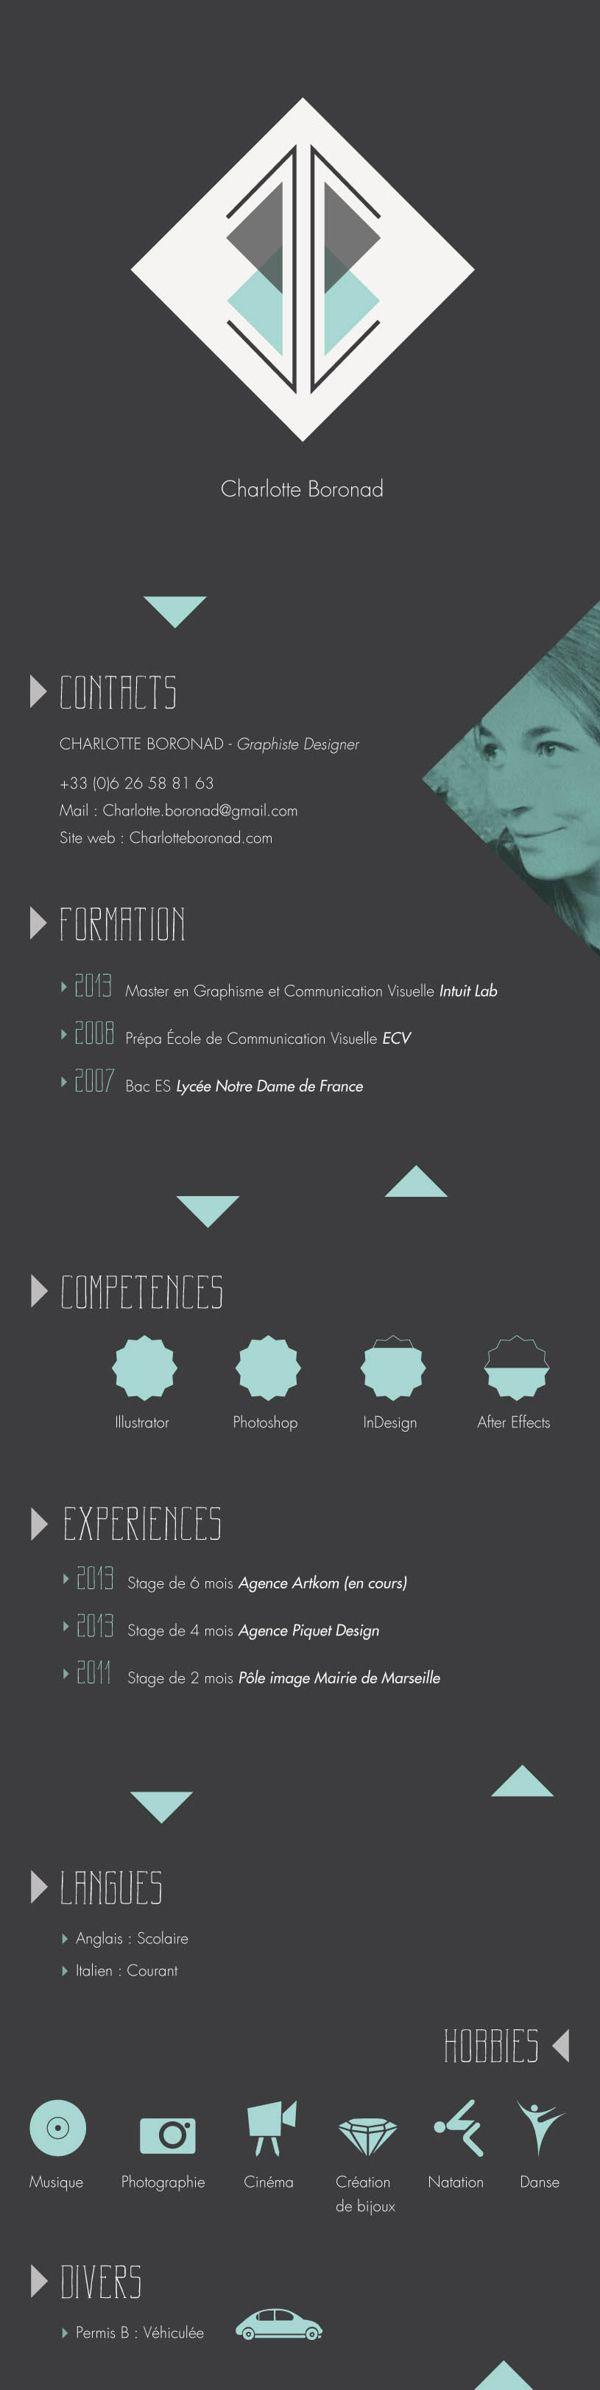 Cv Design Resume Design Resume Cv Graphic